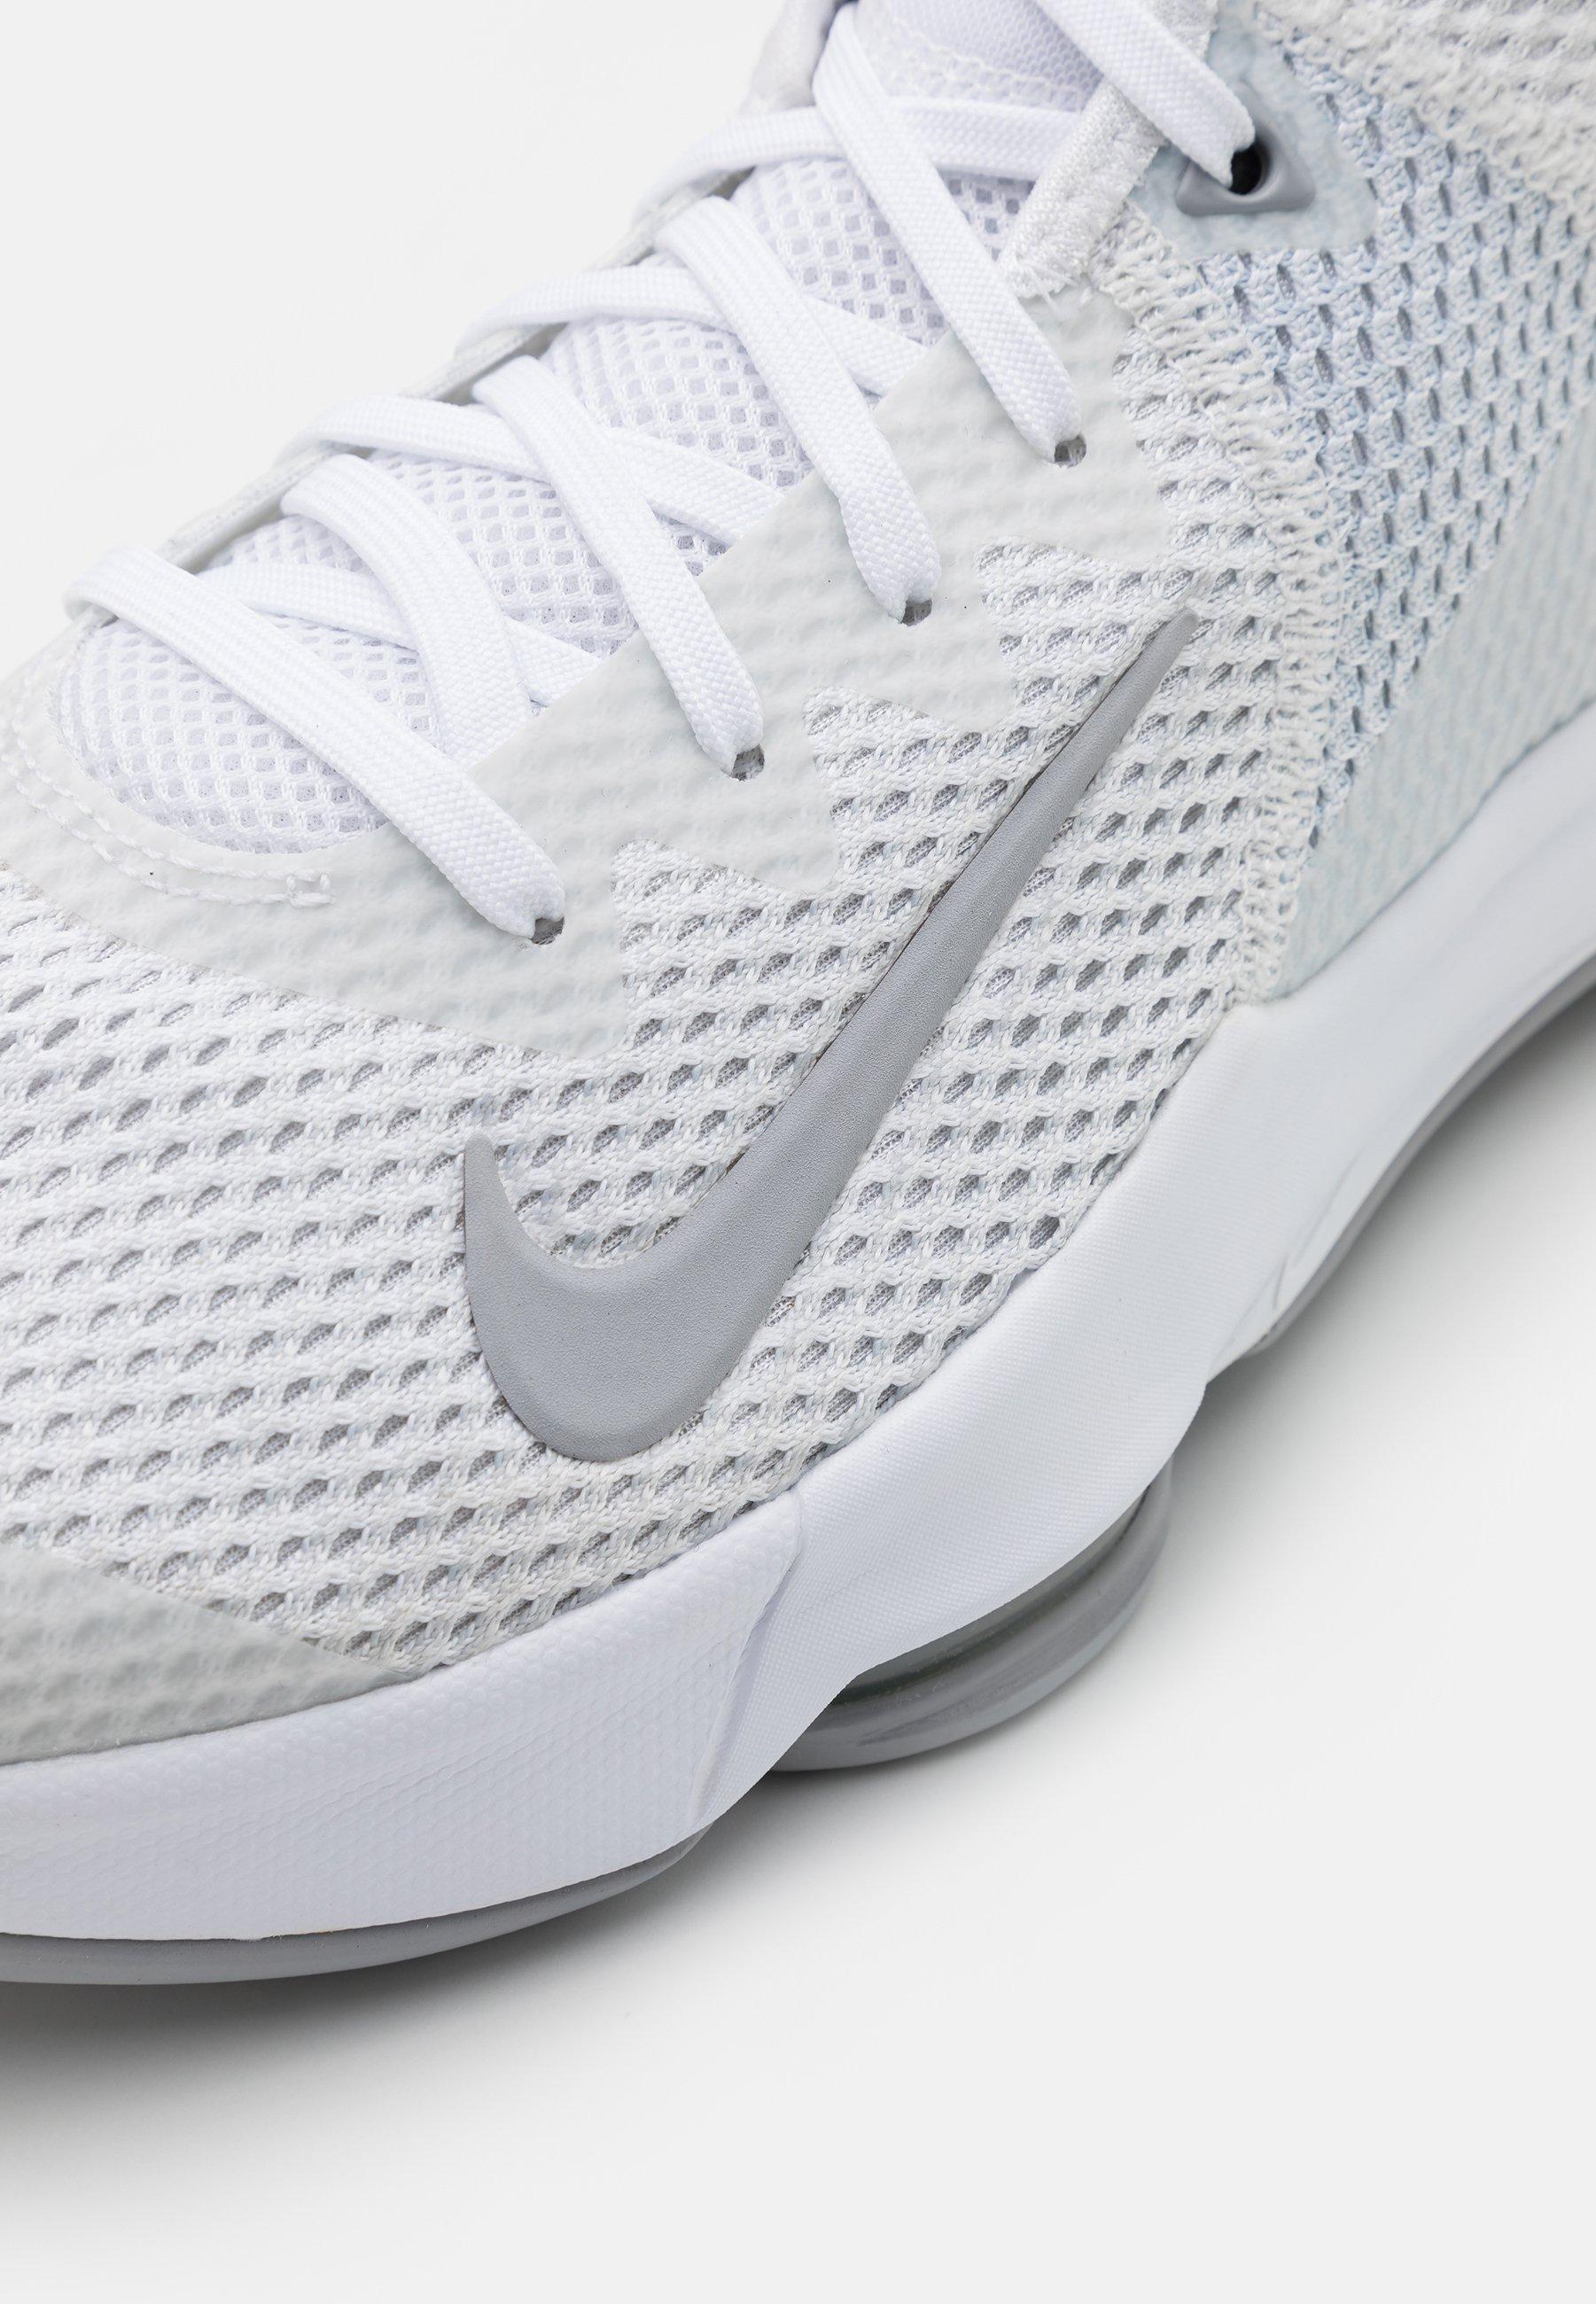 Nike Performance Lebron Witness Iv - Basketbalschoenen White/wolf Grey/pure Platinum Goedkope Schoenen